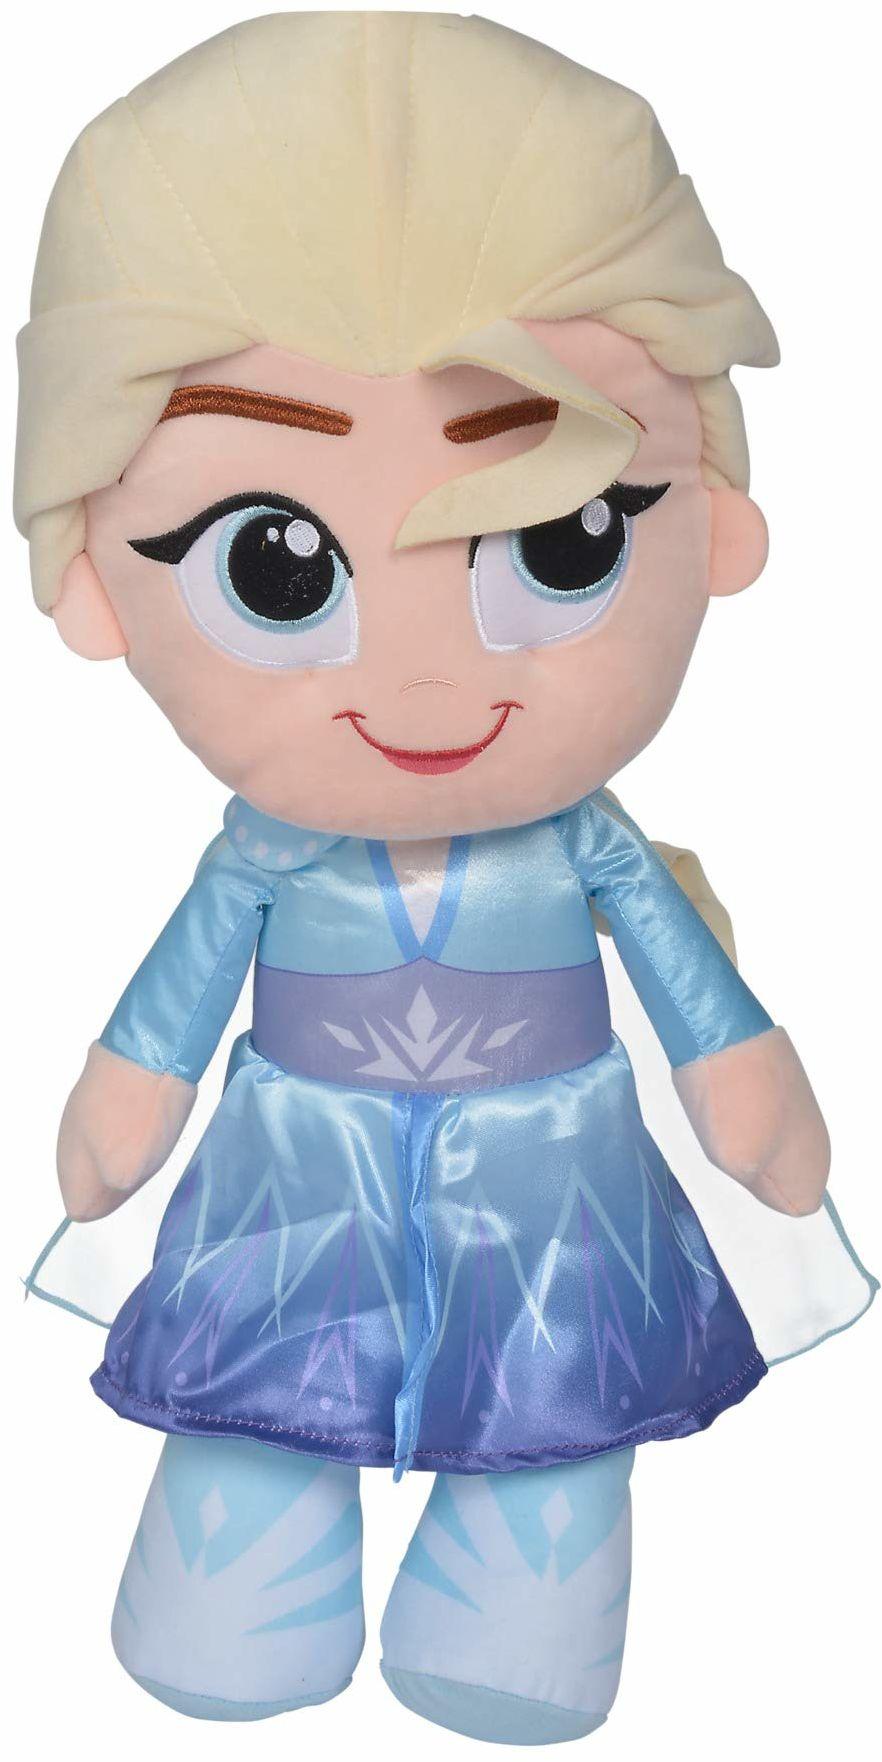 Simba 6315877626 Disney Frozen 2, Chunky ELSA, 43 cm, wielokolorowa, 43 cm